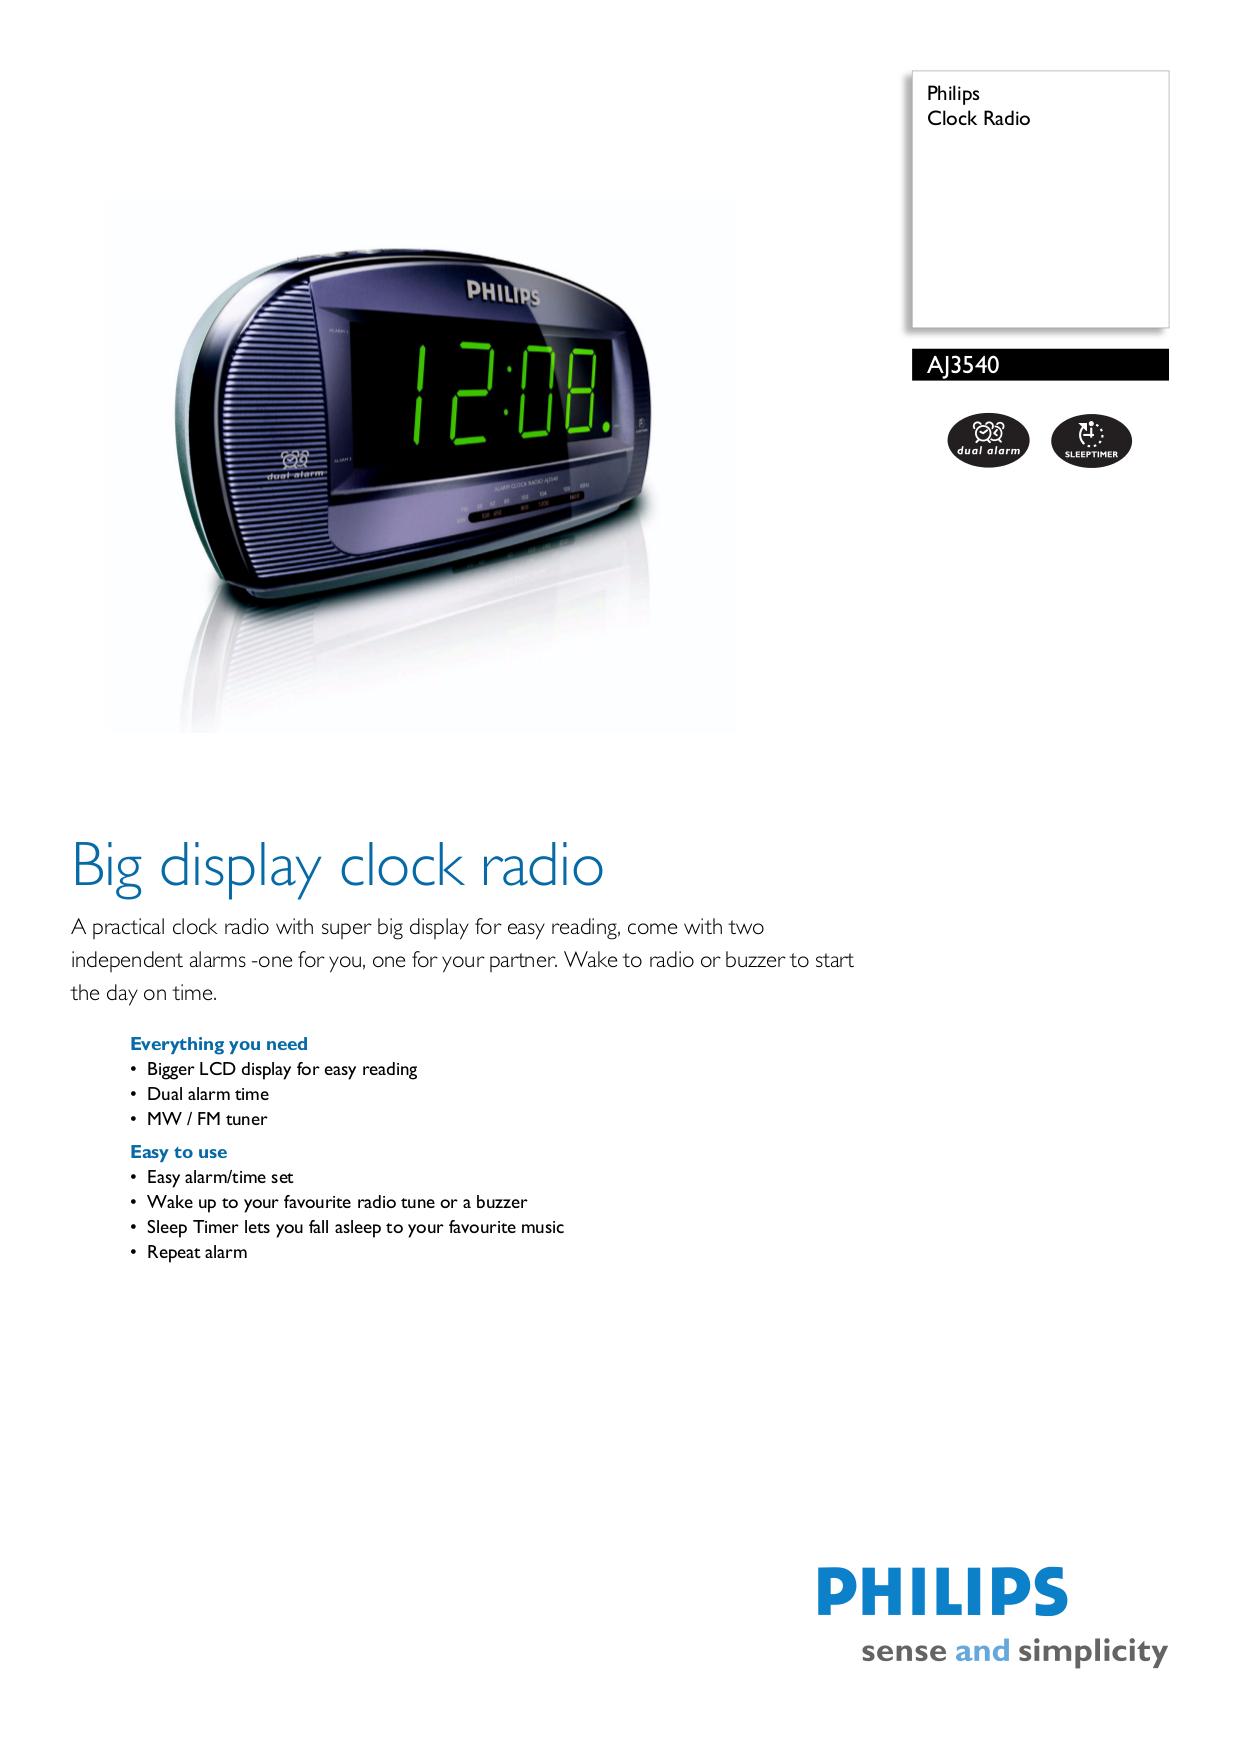 download free pdf for philips aj3540 clock radio manual rh umlib com philips alarm clock radio aj3540 manual Philips Dual Alarm Clock Radio